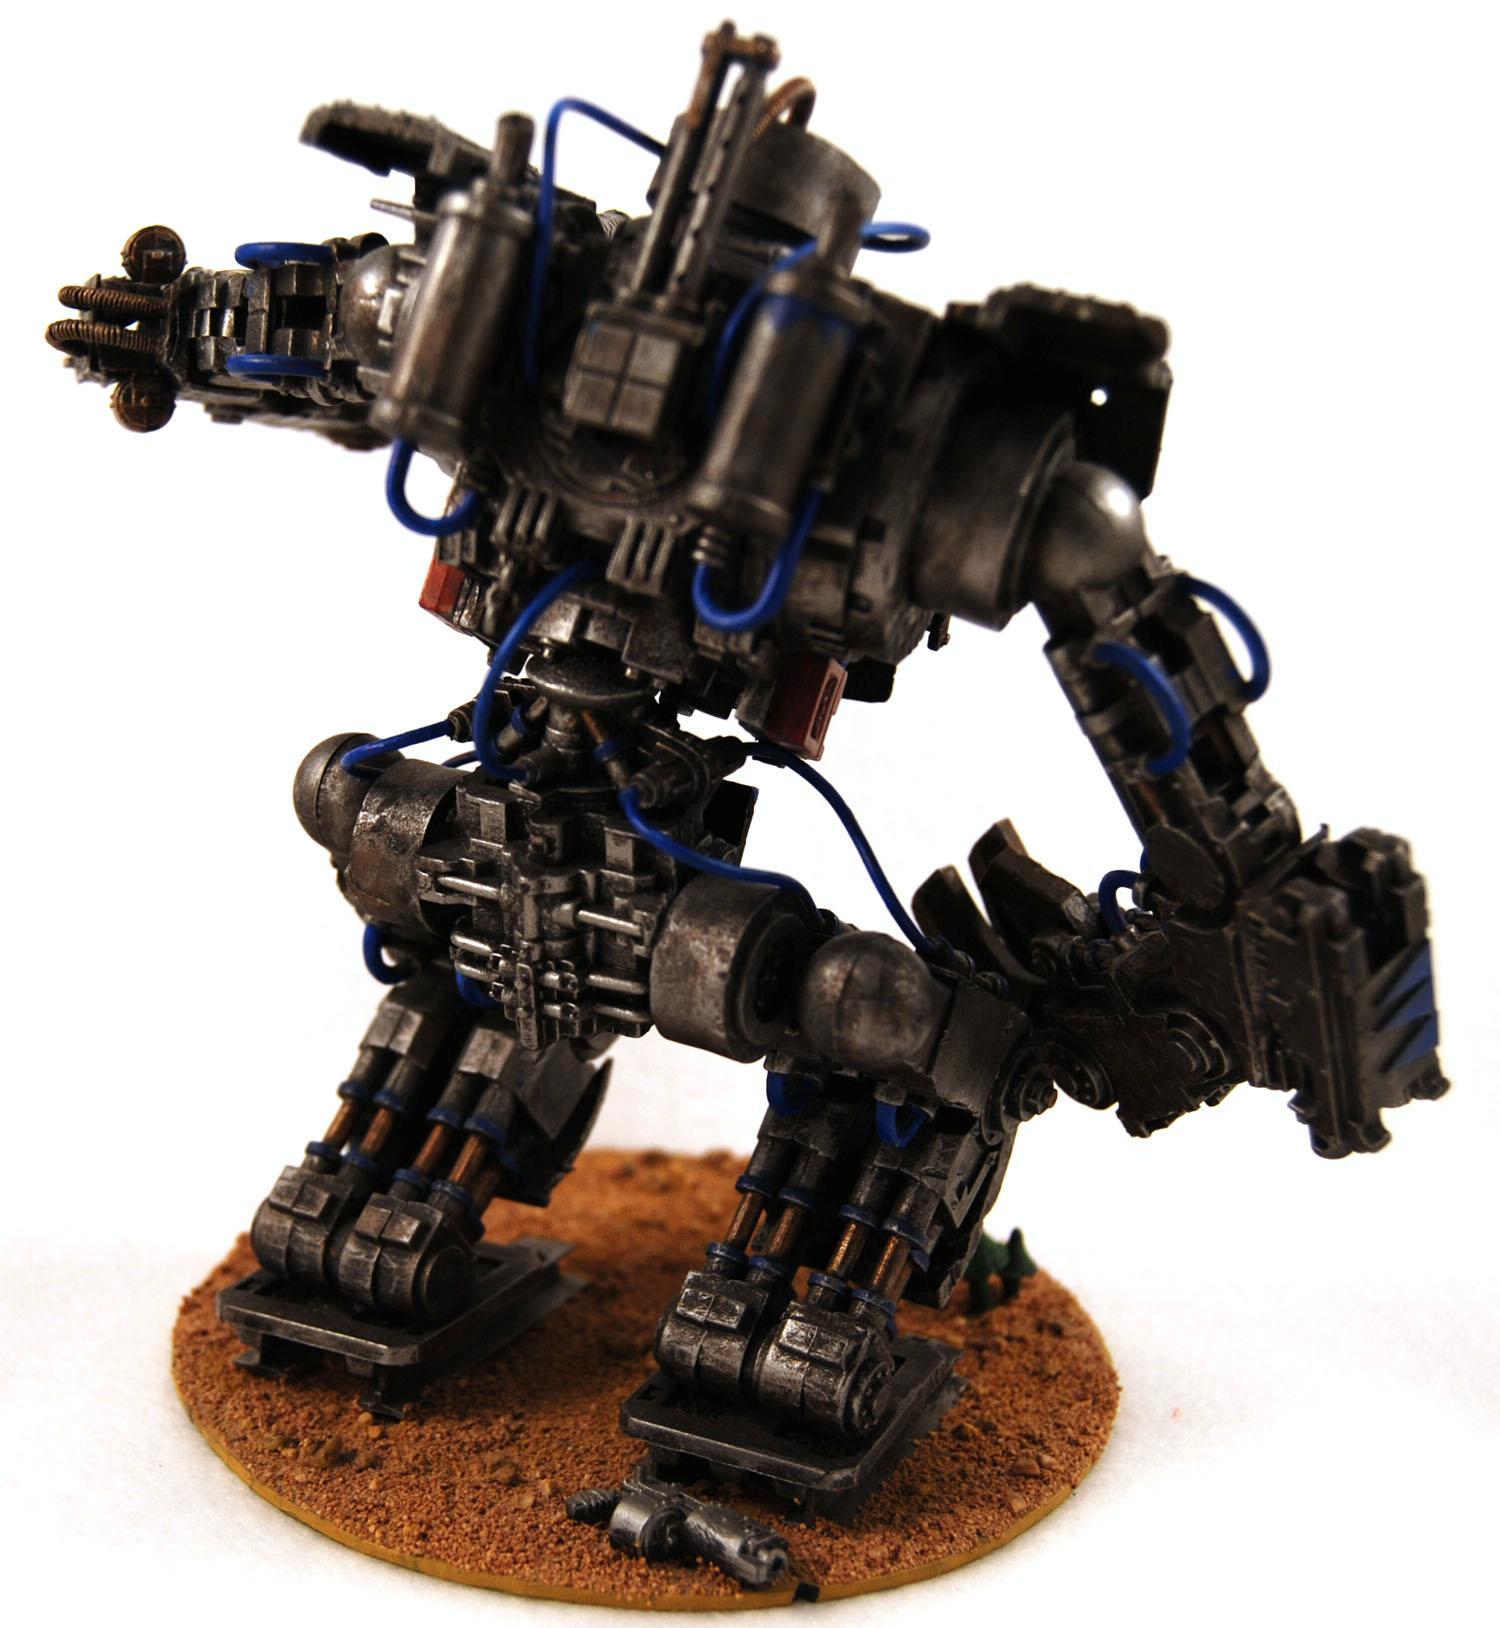 Deathskulls, Looted, Orks, Plasticard, Scratch Build, Stompa, Warhammer 40,000